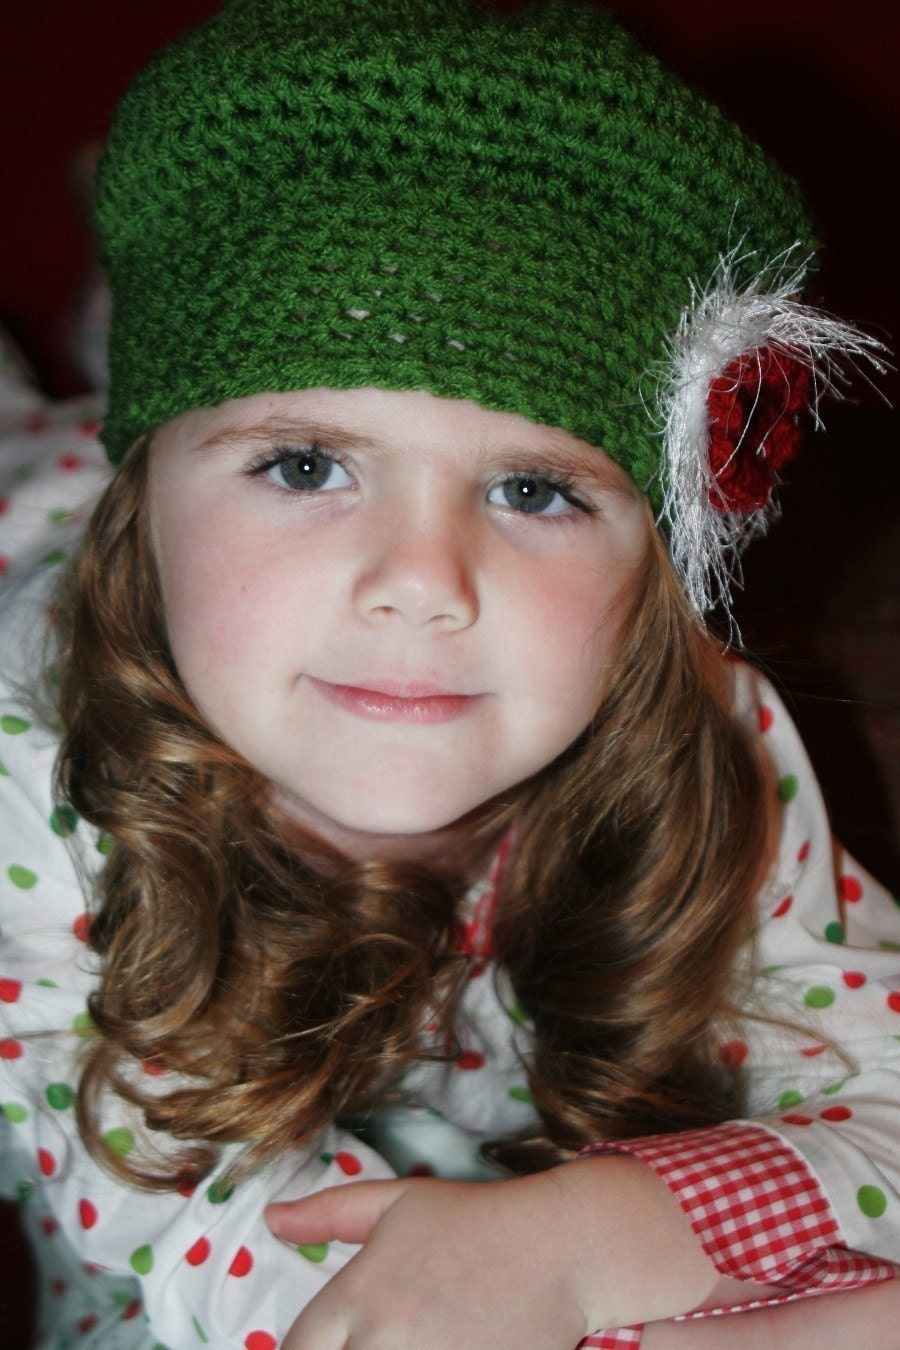 کودک یکنوع عرقچین کوچک کهمحصلین برسر میگذارند Poof آشپز کلاه کلاه بره سرپا نگه داشتن الگوی عکاسی